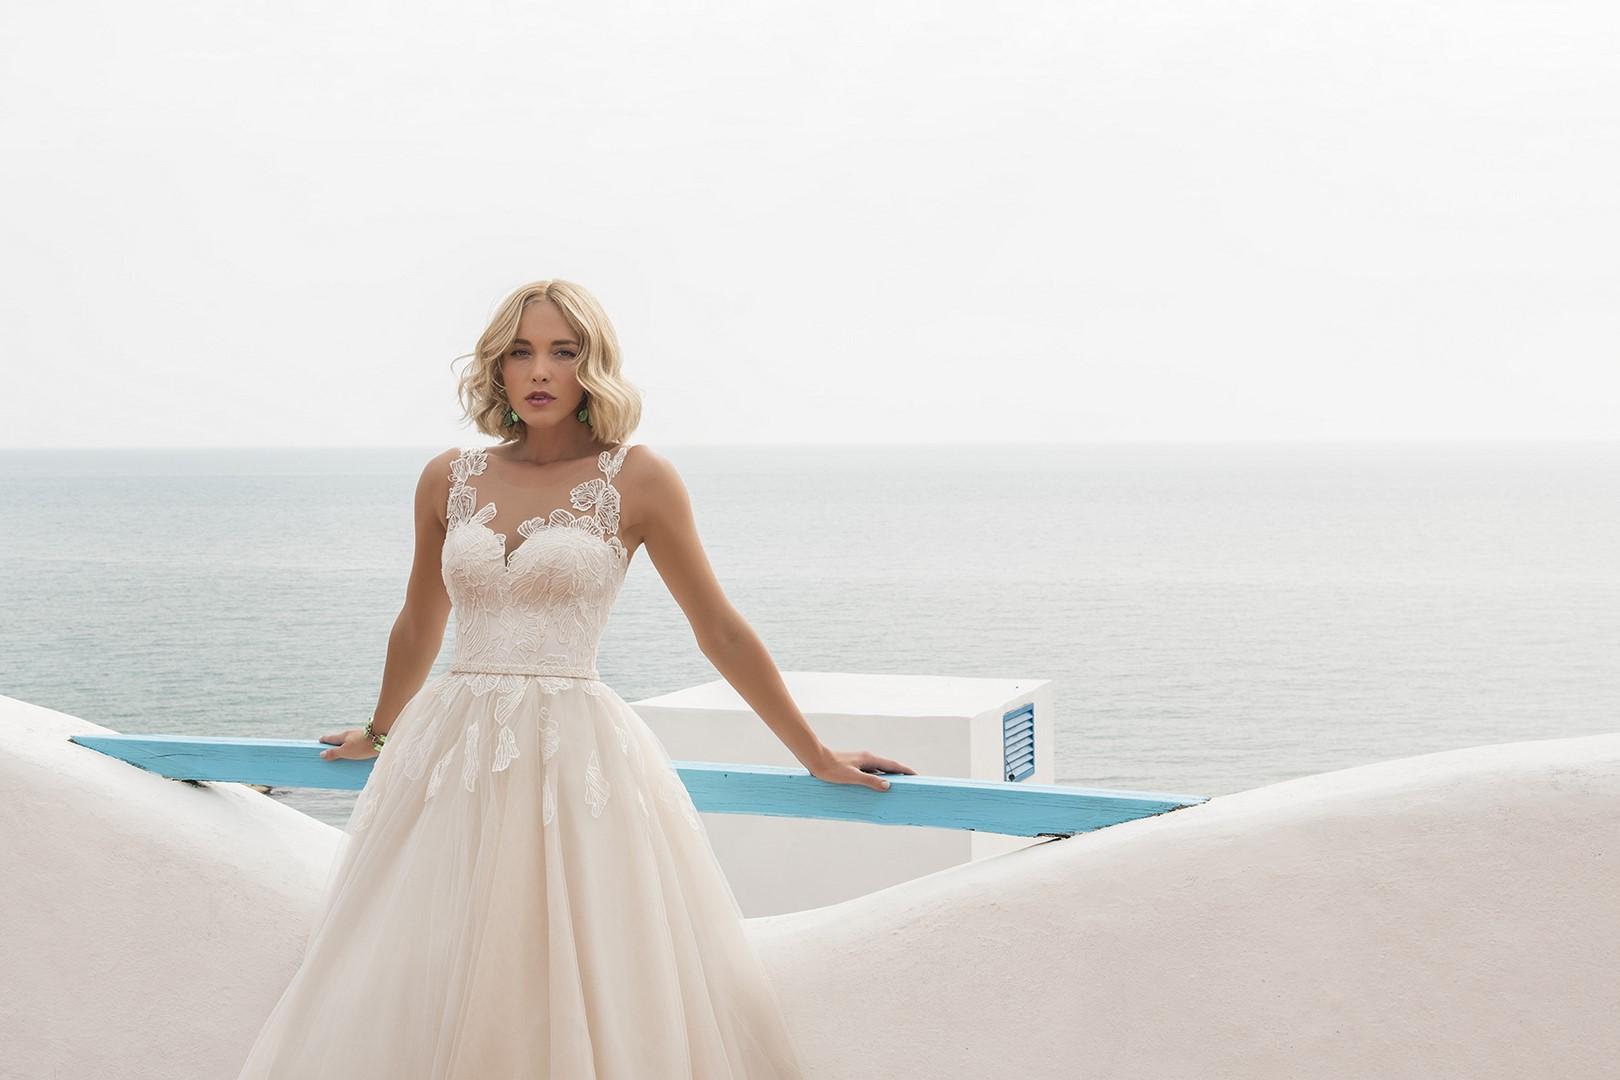 Anastasia-Jillian Elianto-0898-WEB Jillian Abiti da sposa Collezione 2020.jpg